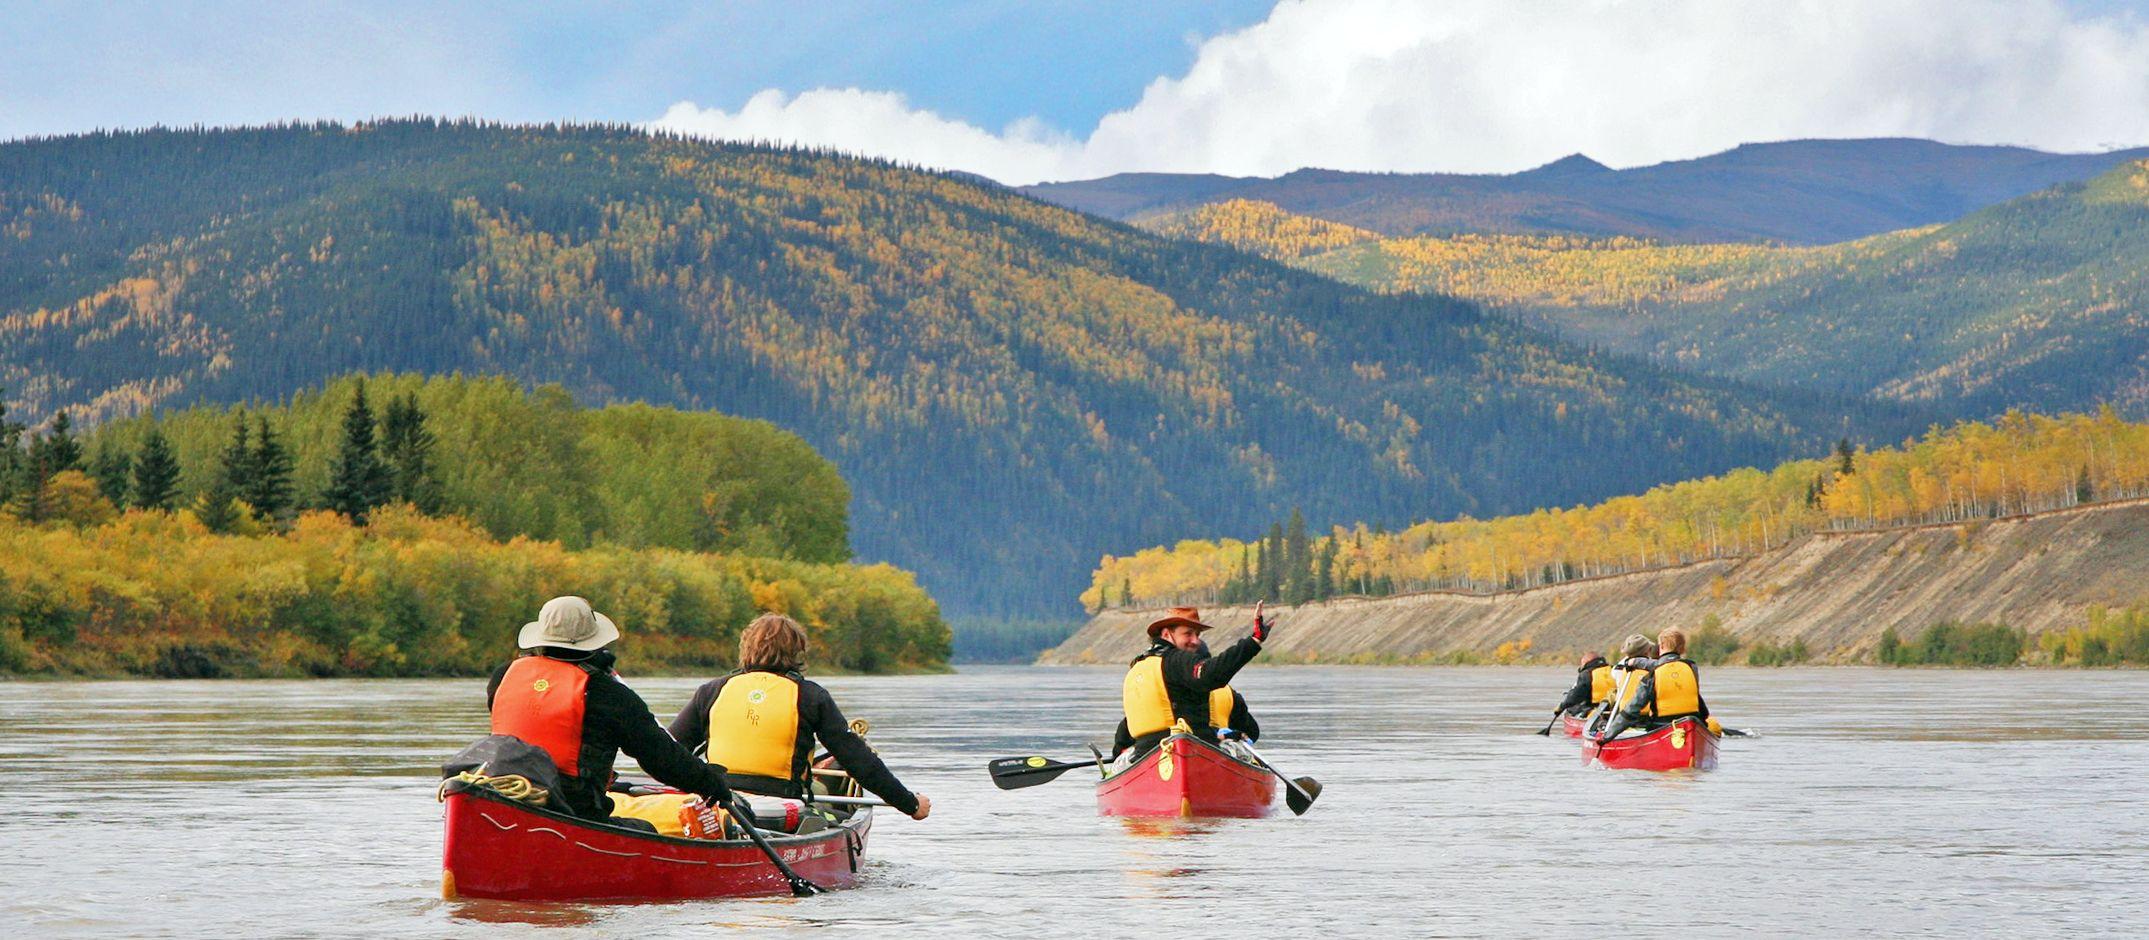 Kanu-Tour auf dem Yukon River